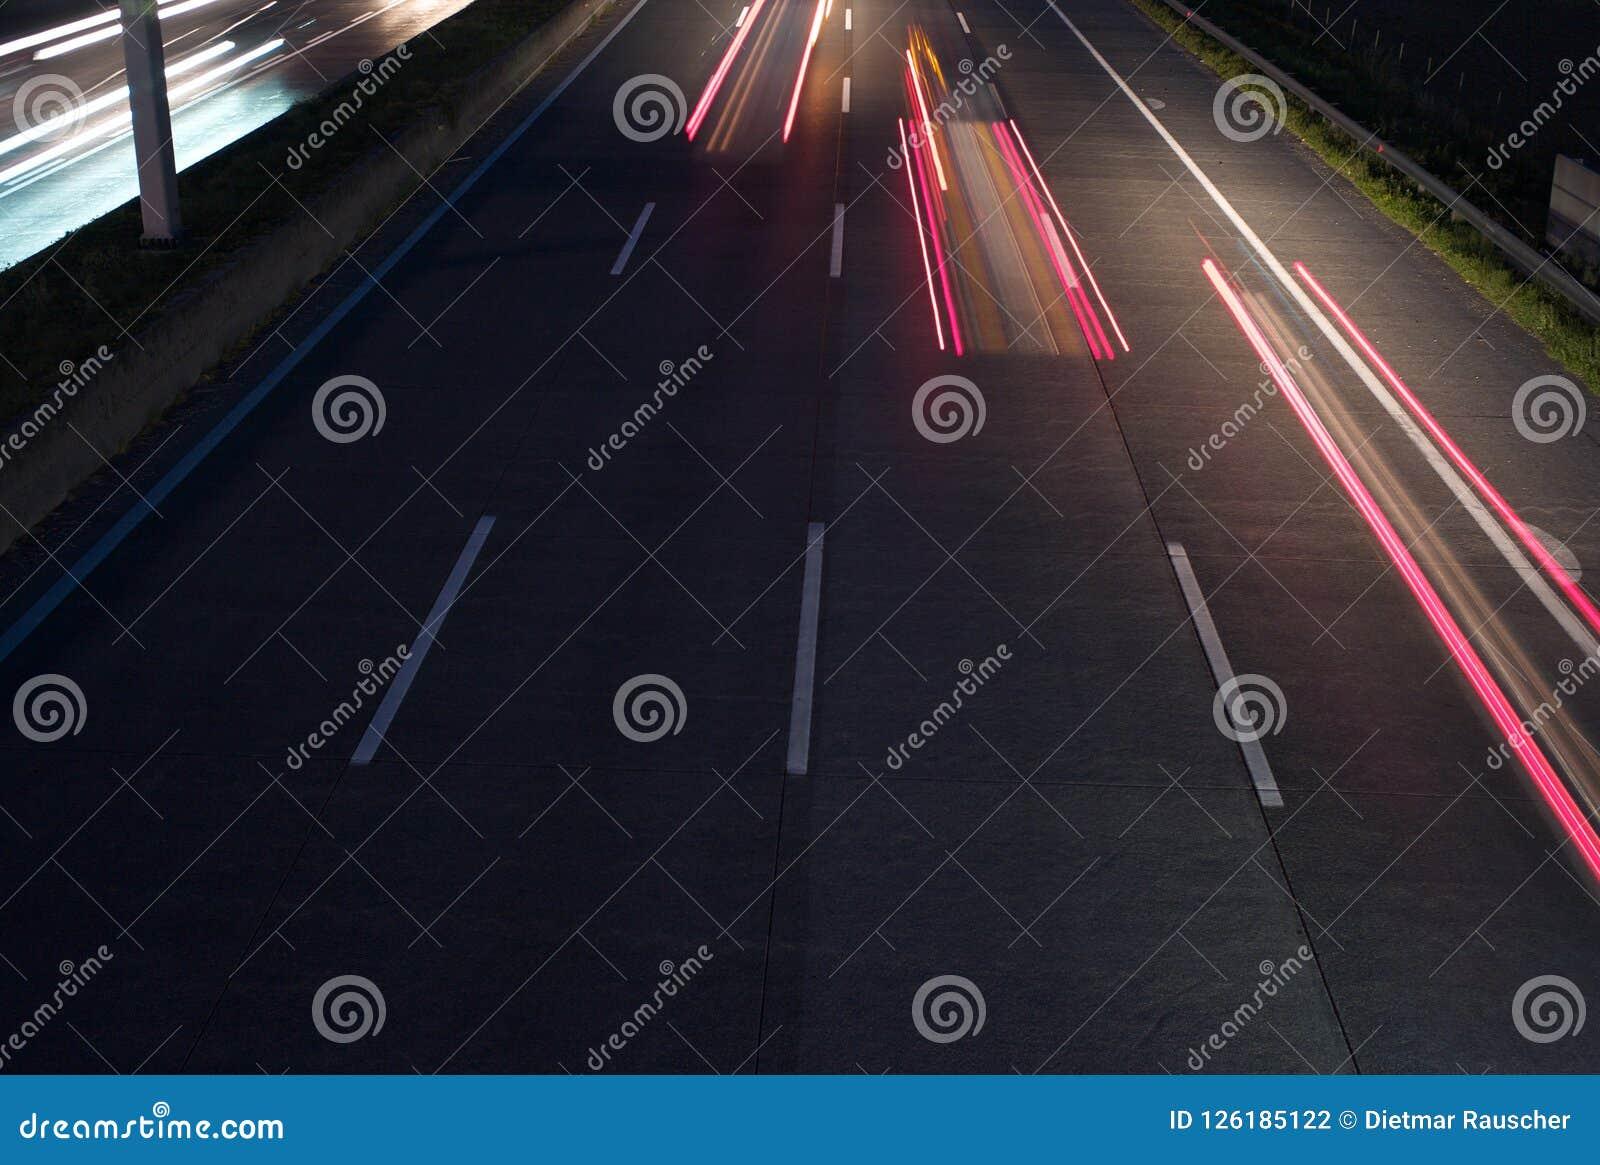 Drie Rode Achterlichten op de Snelweg